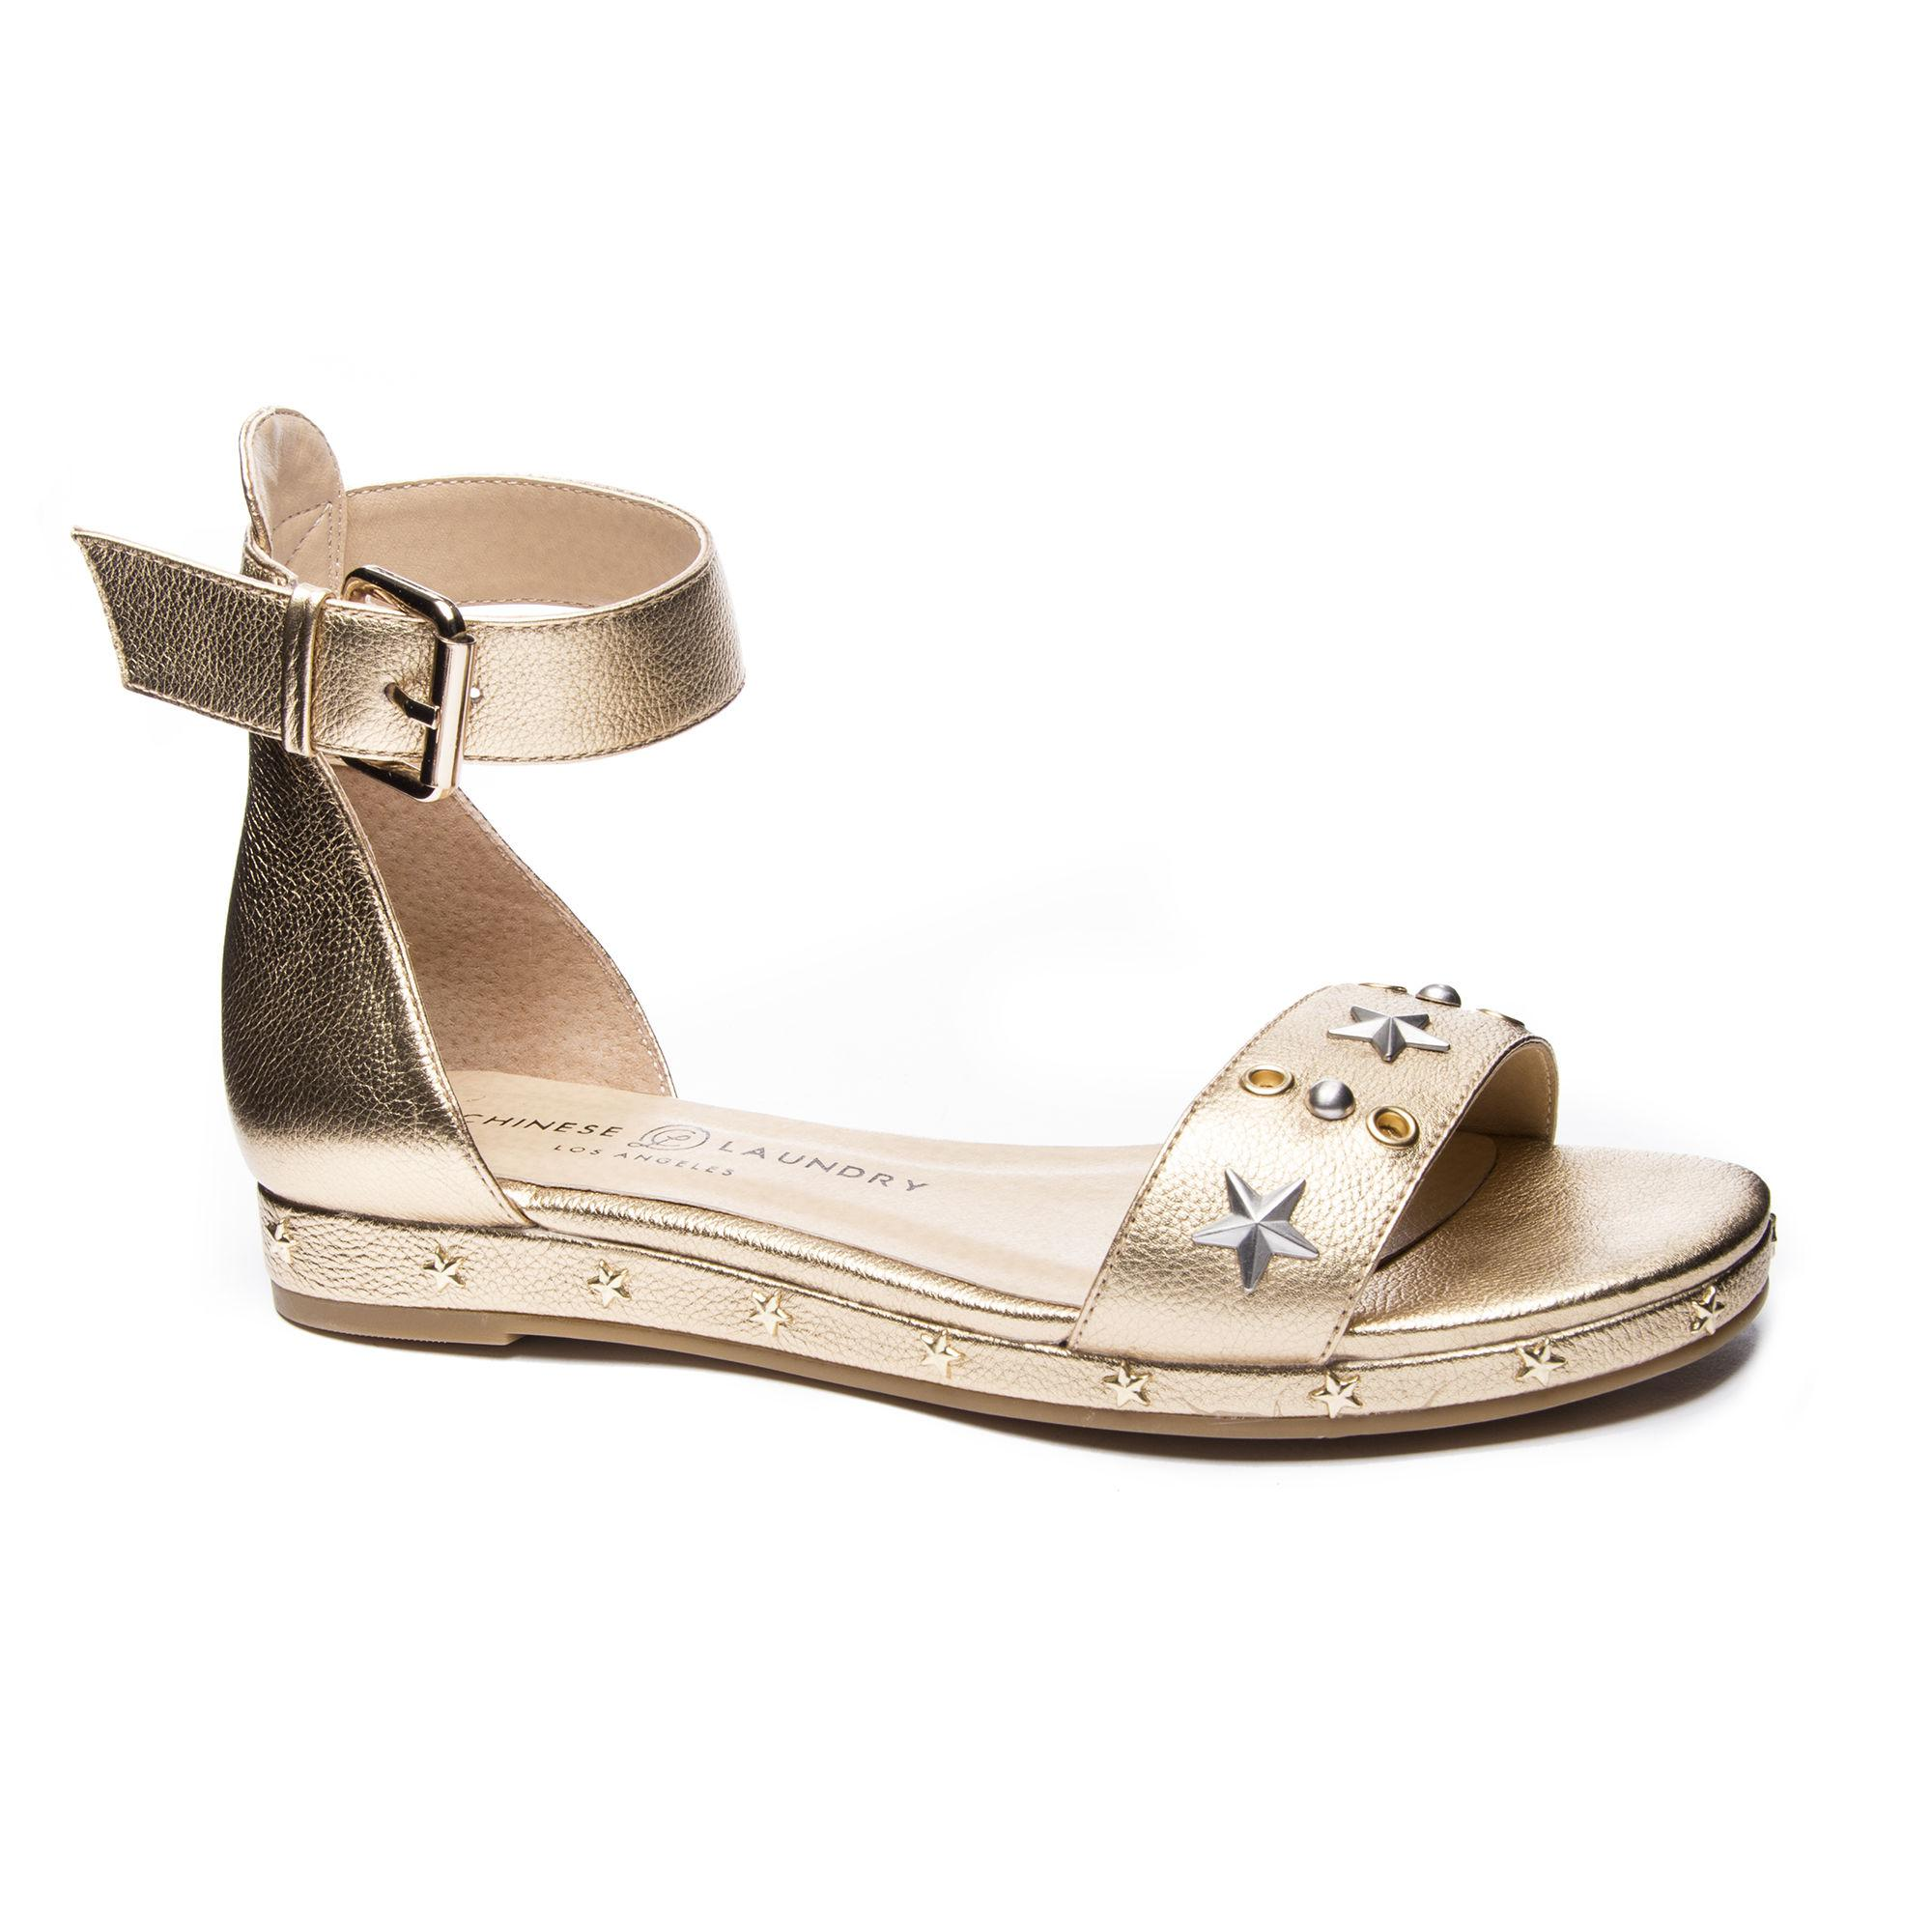 e150cc6cdff Lyst - Chinese Laundry Grady Metallic Flat Sandal in Metallic